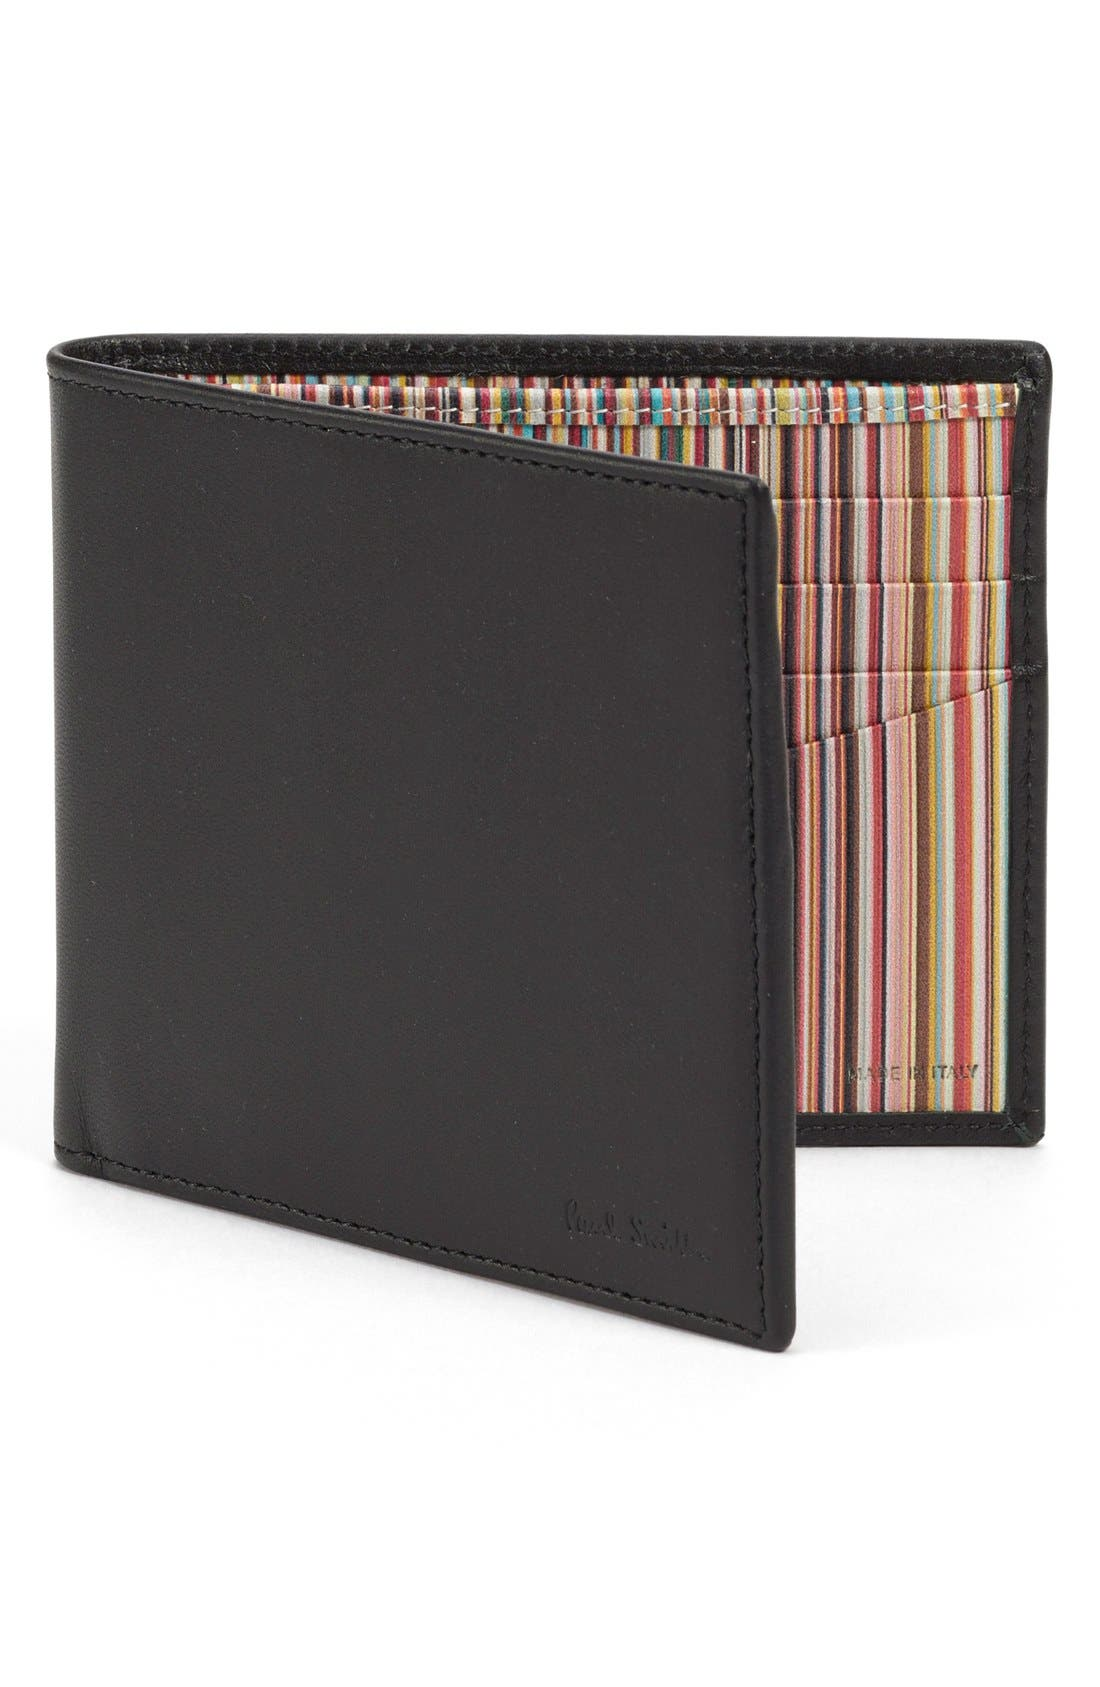 Alternate Image 1 Selected - Paul Smith Interior Stripe Leather Billfold